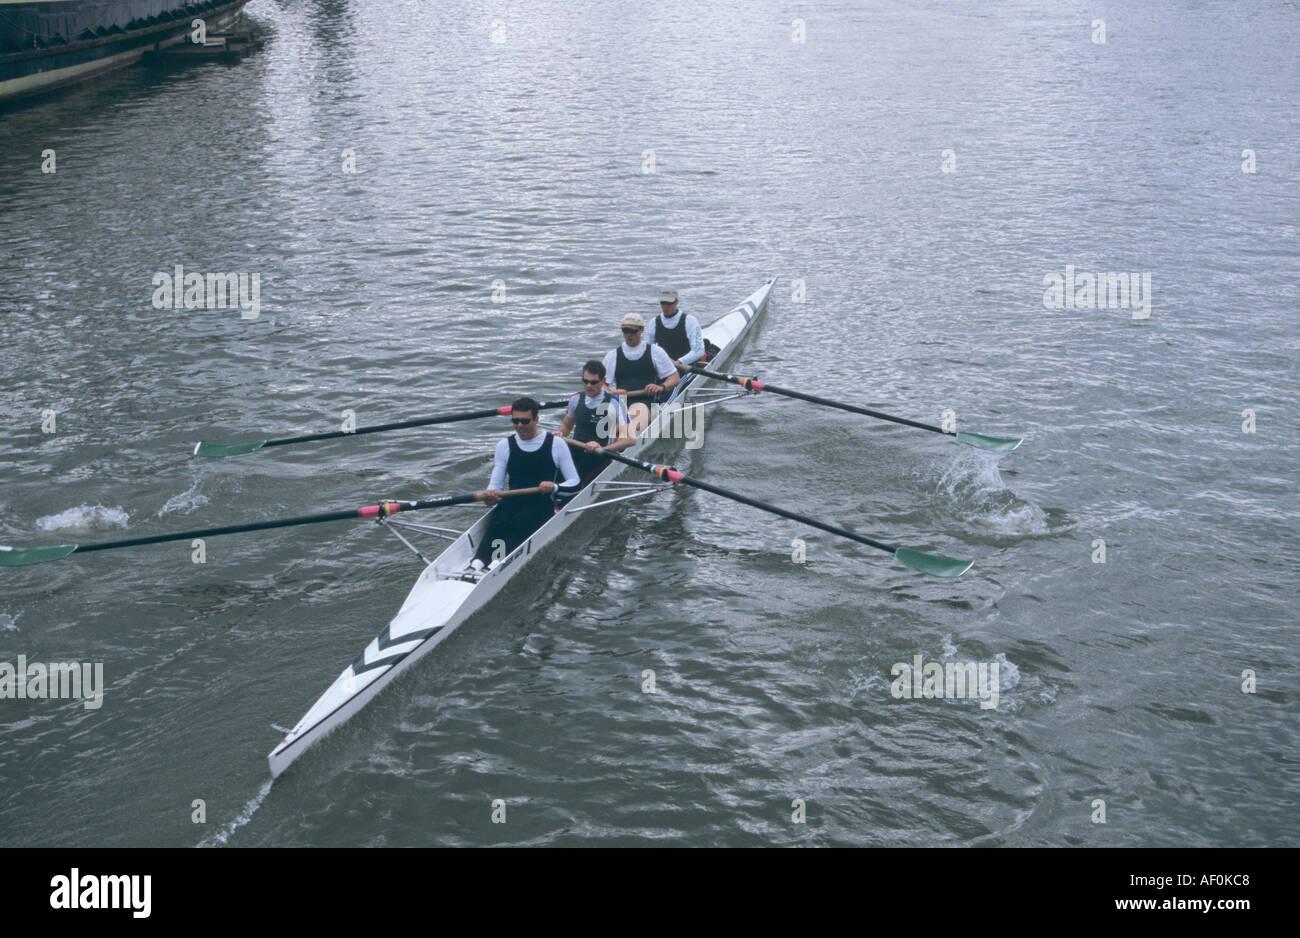 Four man rowing team on the Avon river Bristol - Stock Image